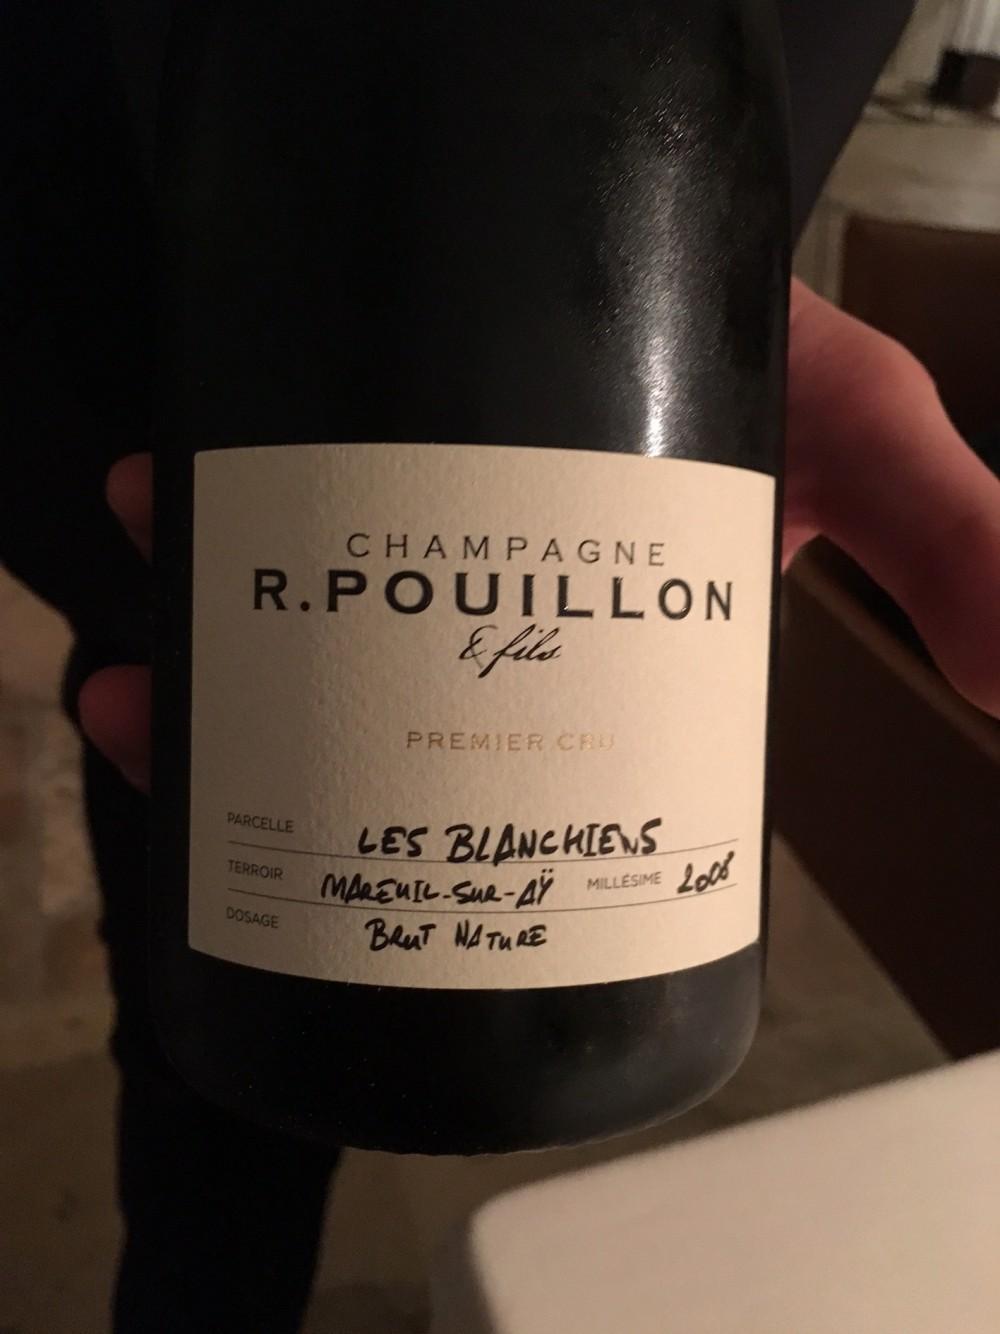 Champagne R. Pouillon e fils